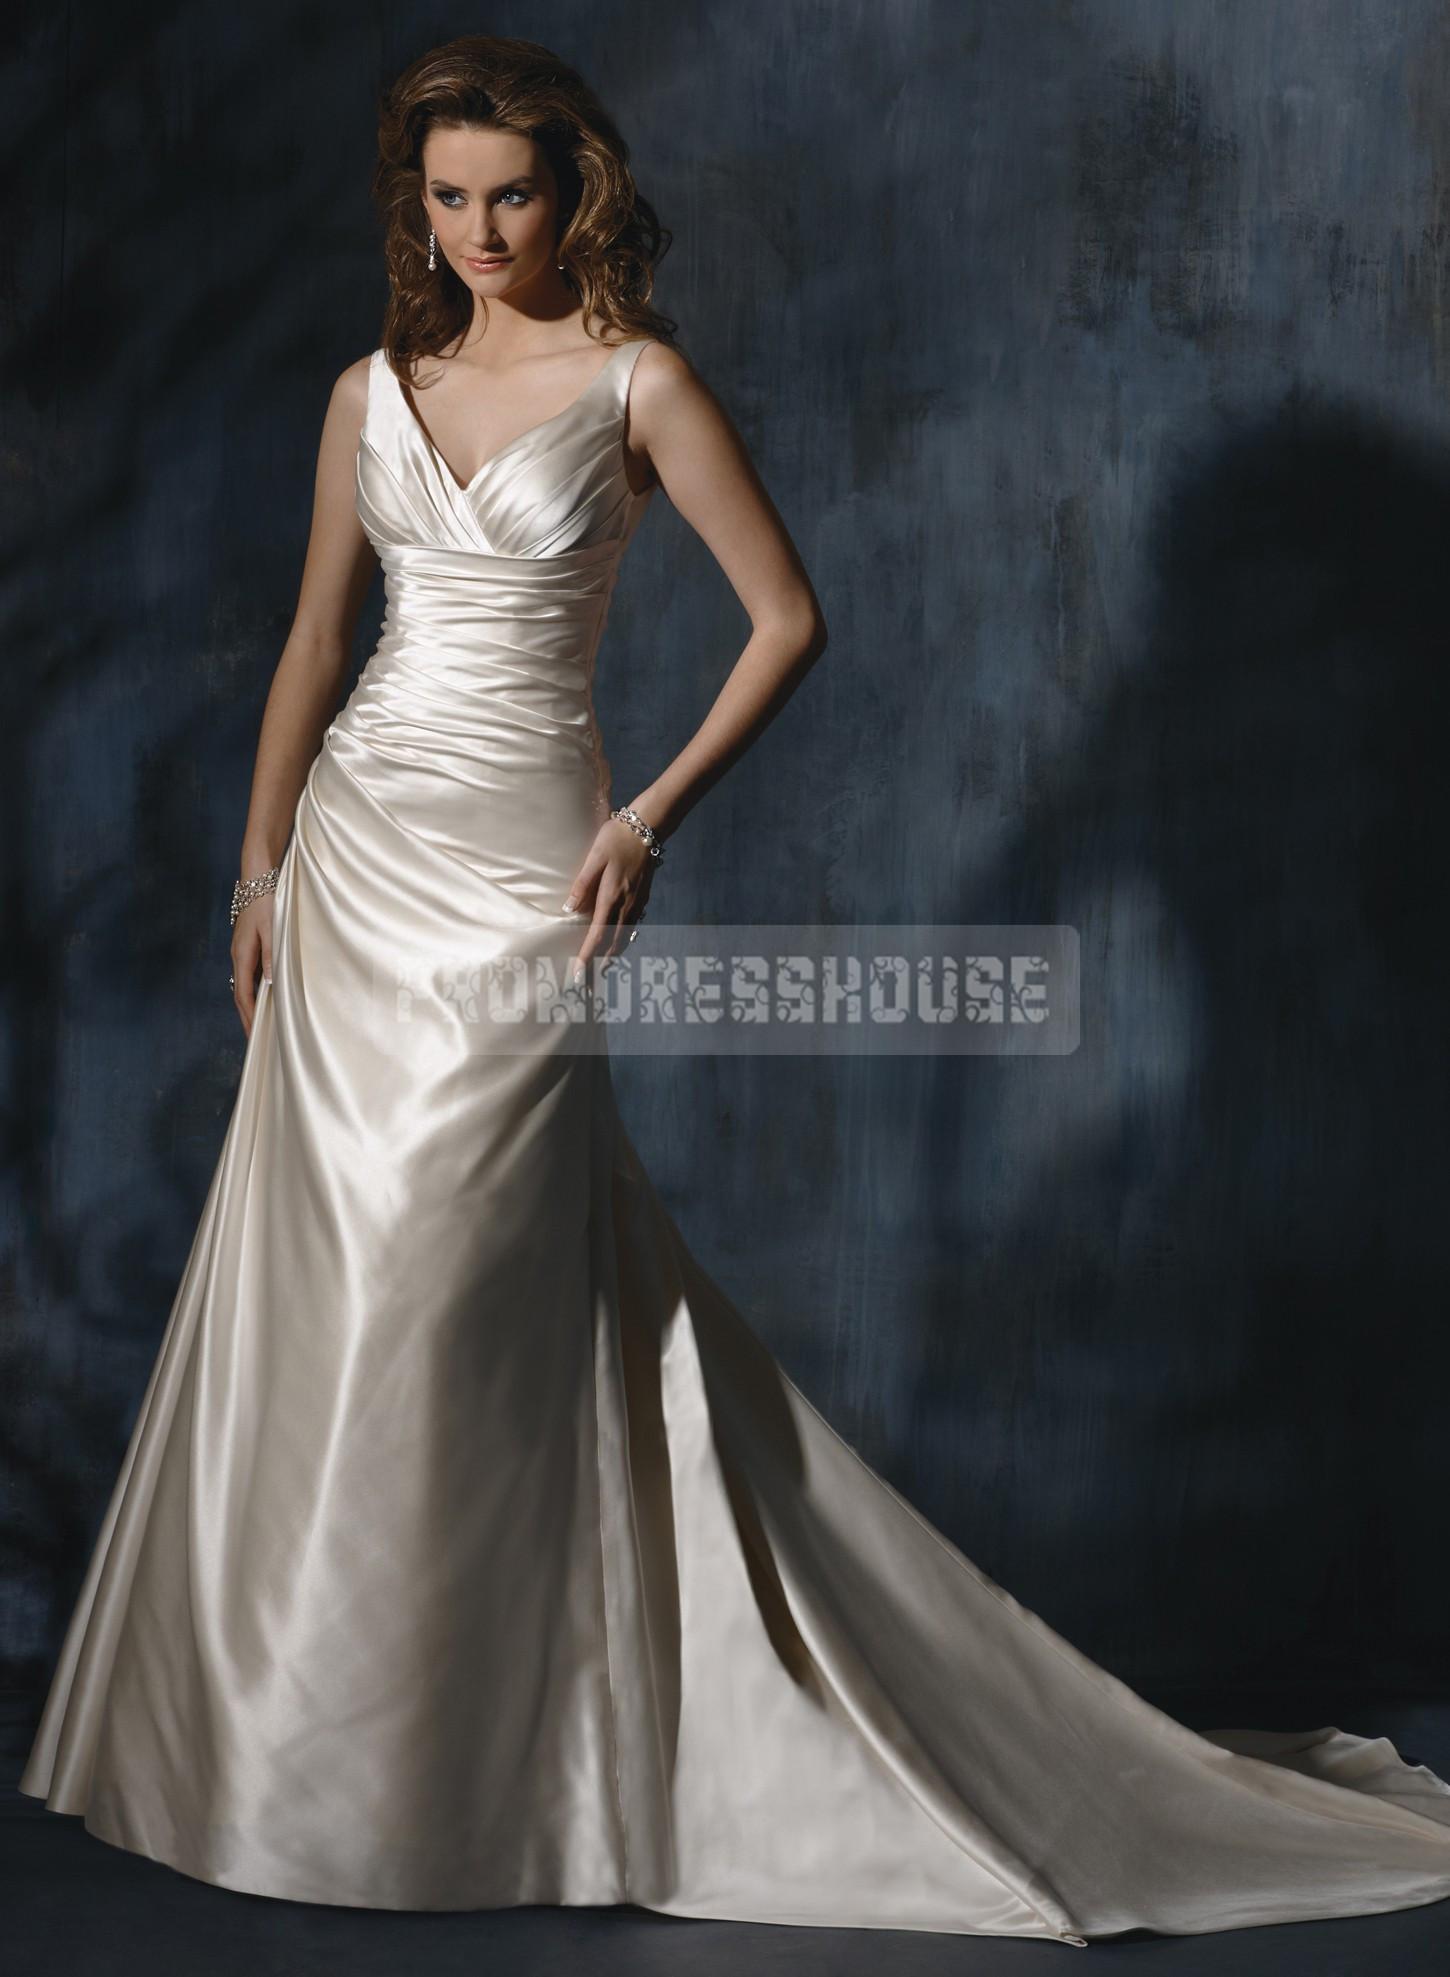 V-neck Chapel Train Ruching Satin Sleeveless Wedding Dress - Promdresshouse.com